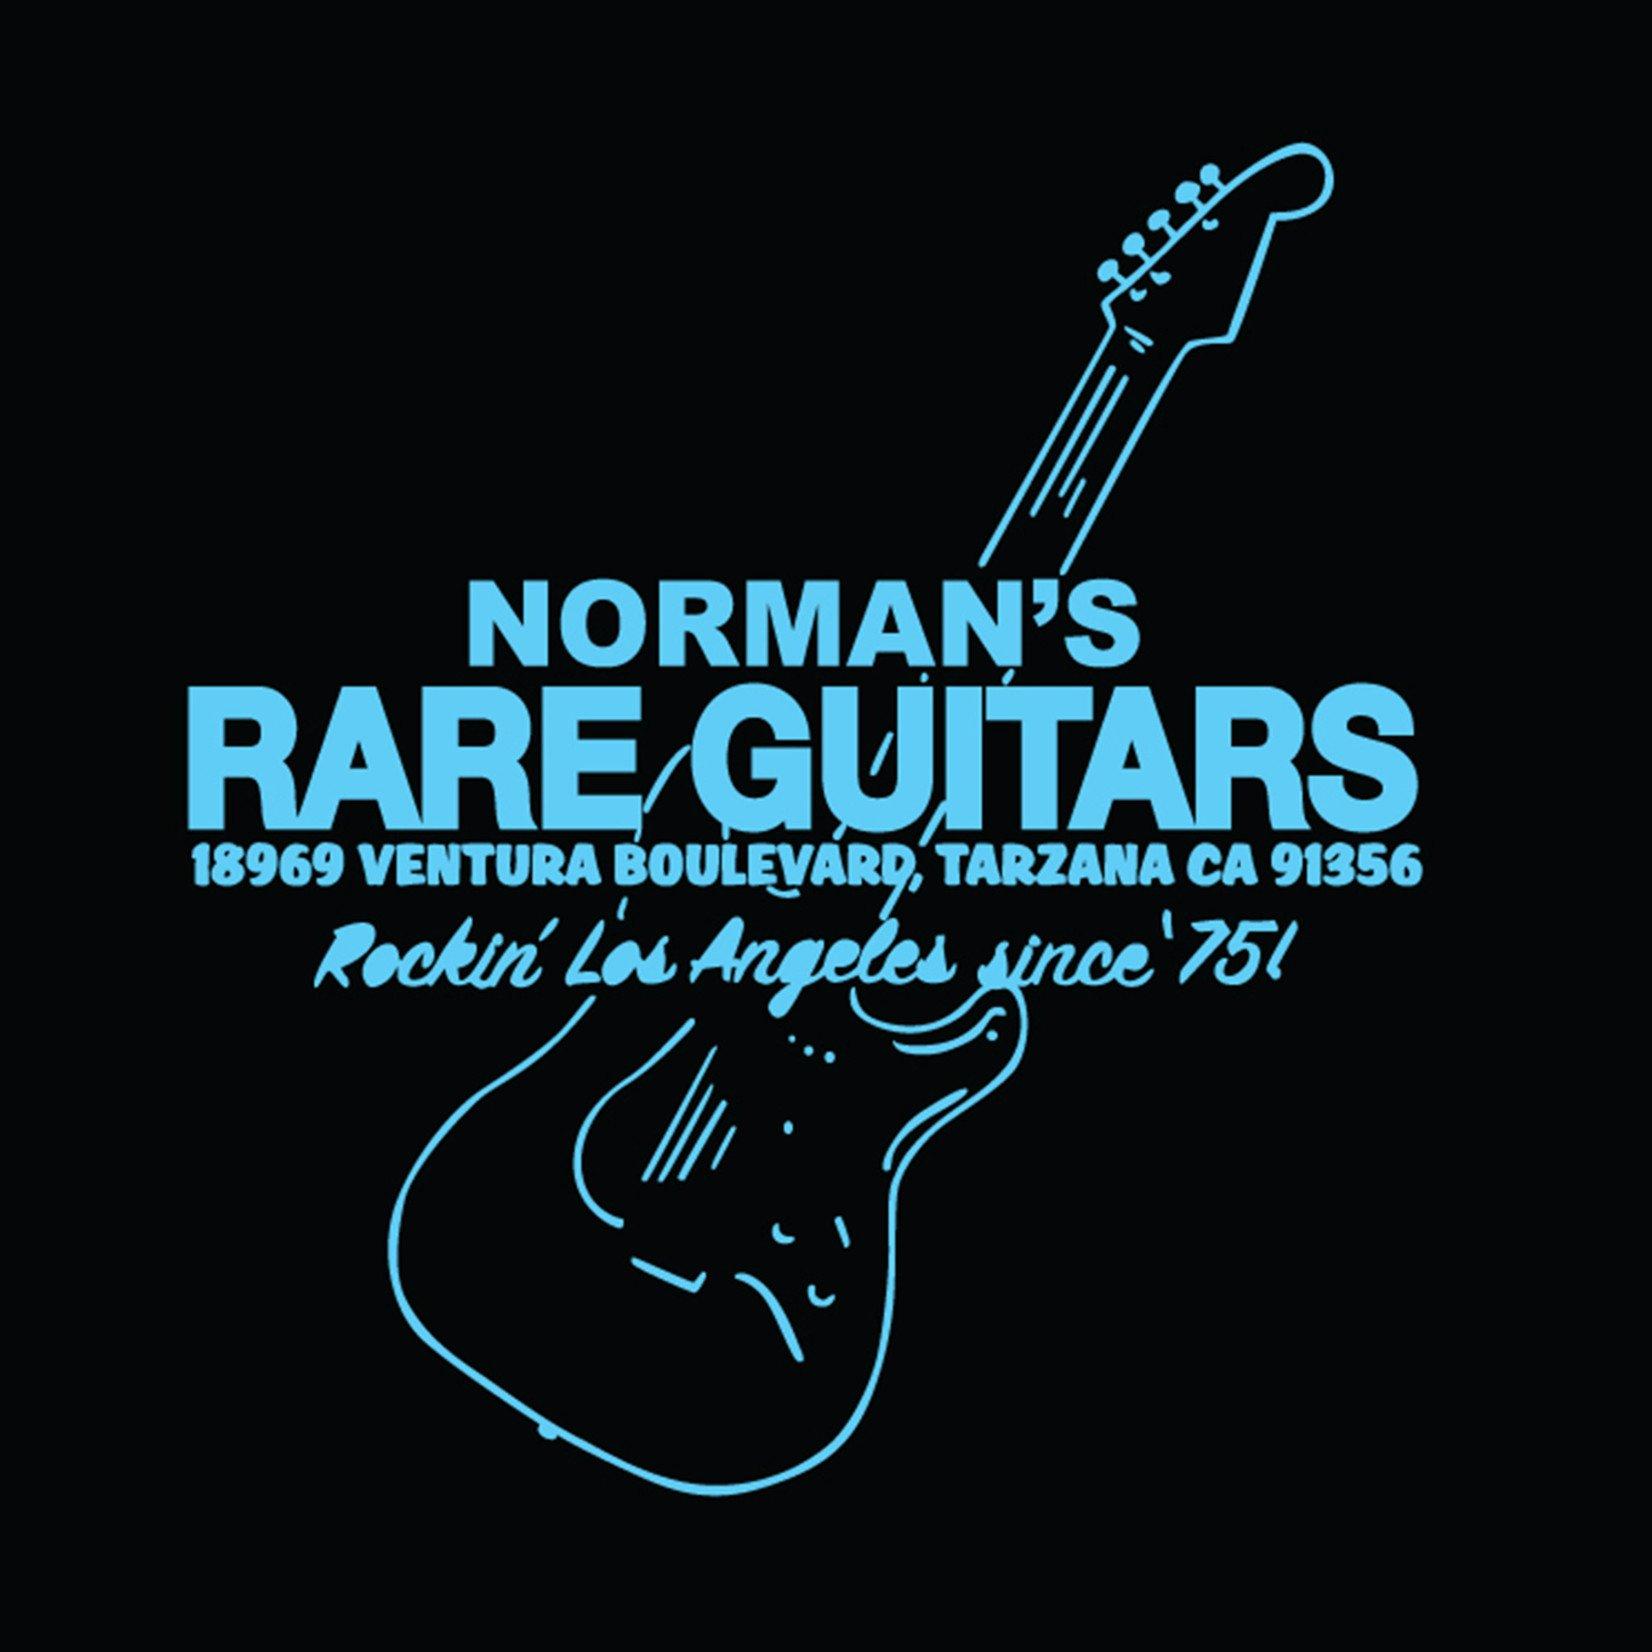 Norman's Rare Guitars Forgetting Sarah Marshall T-Shirt